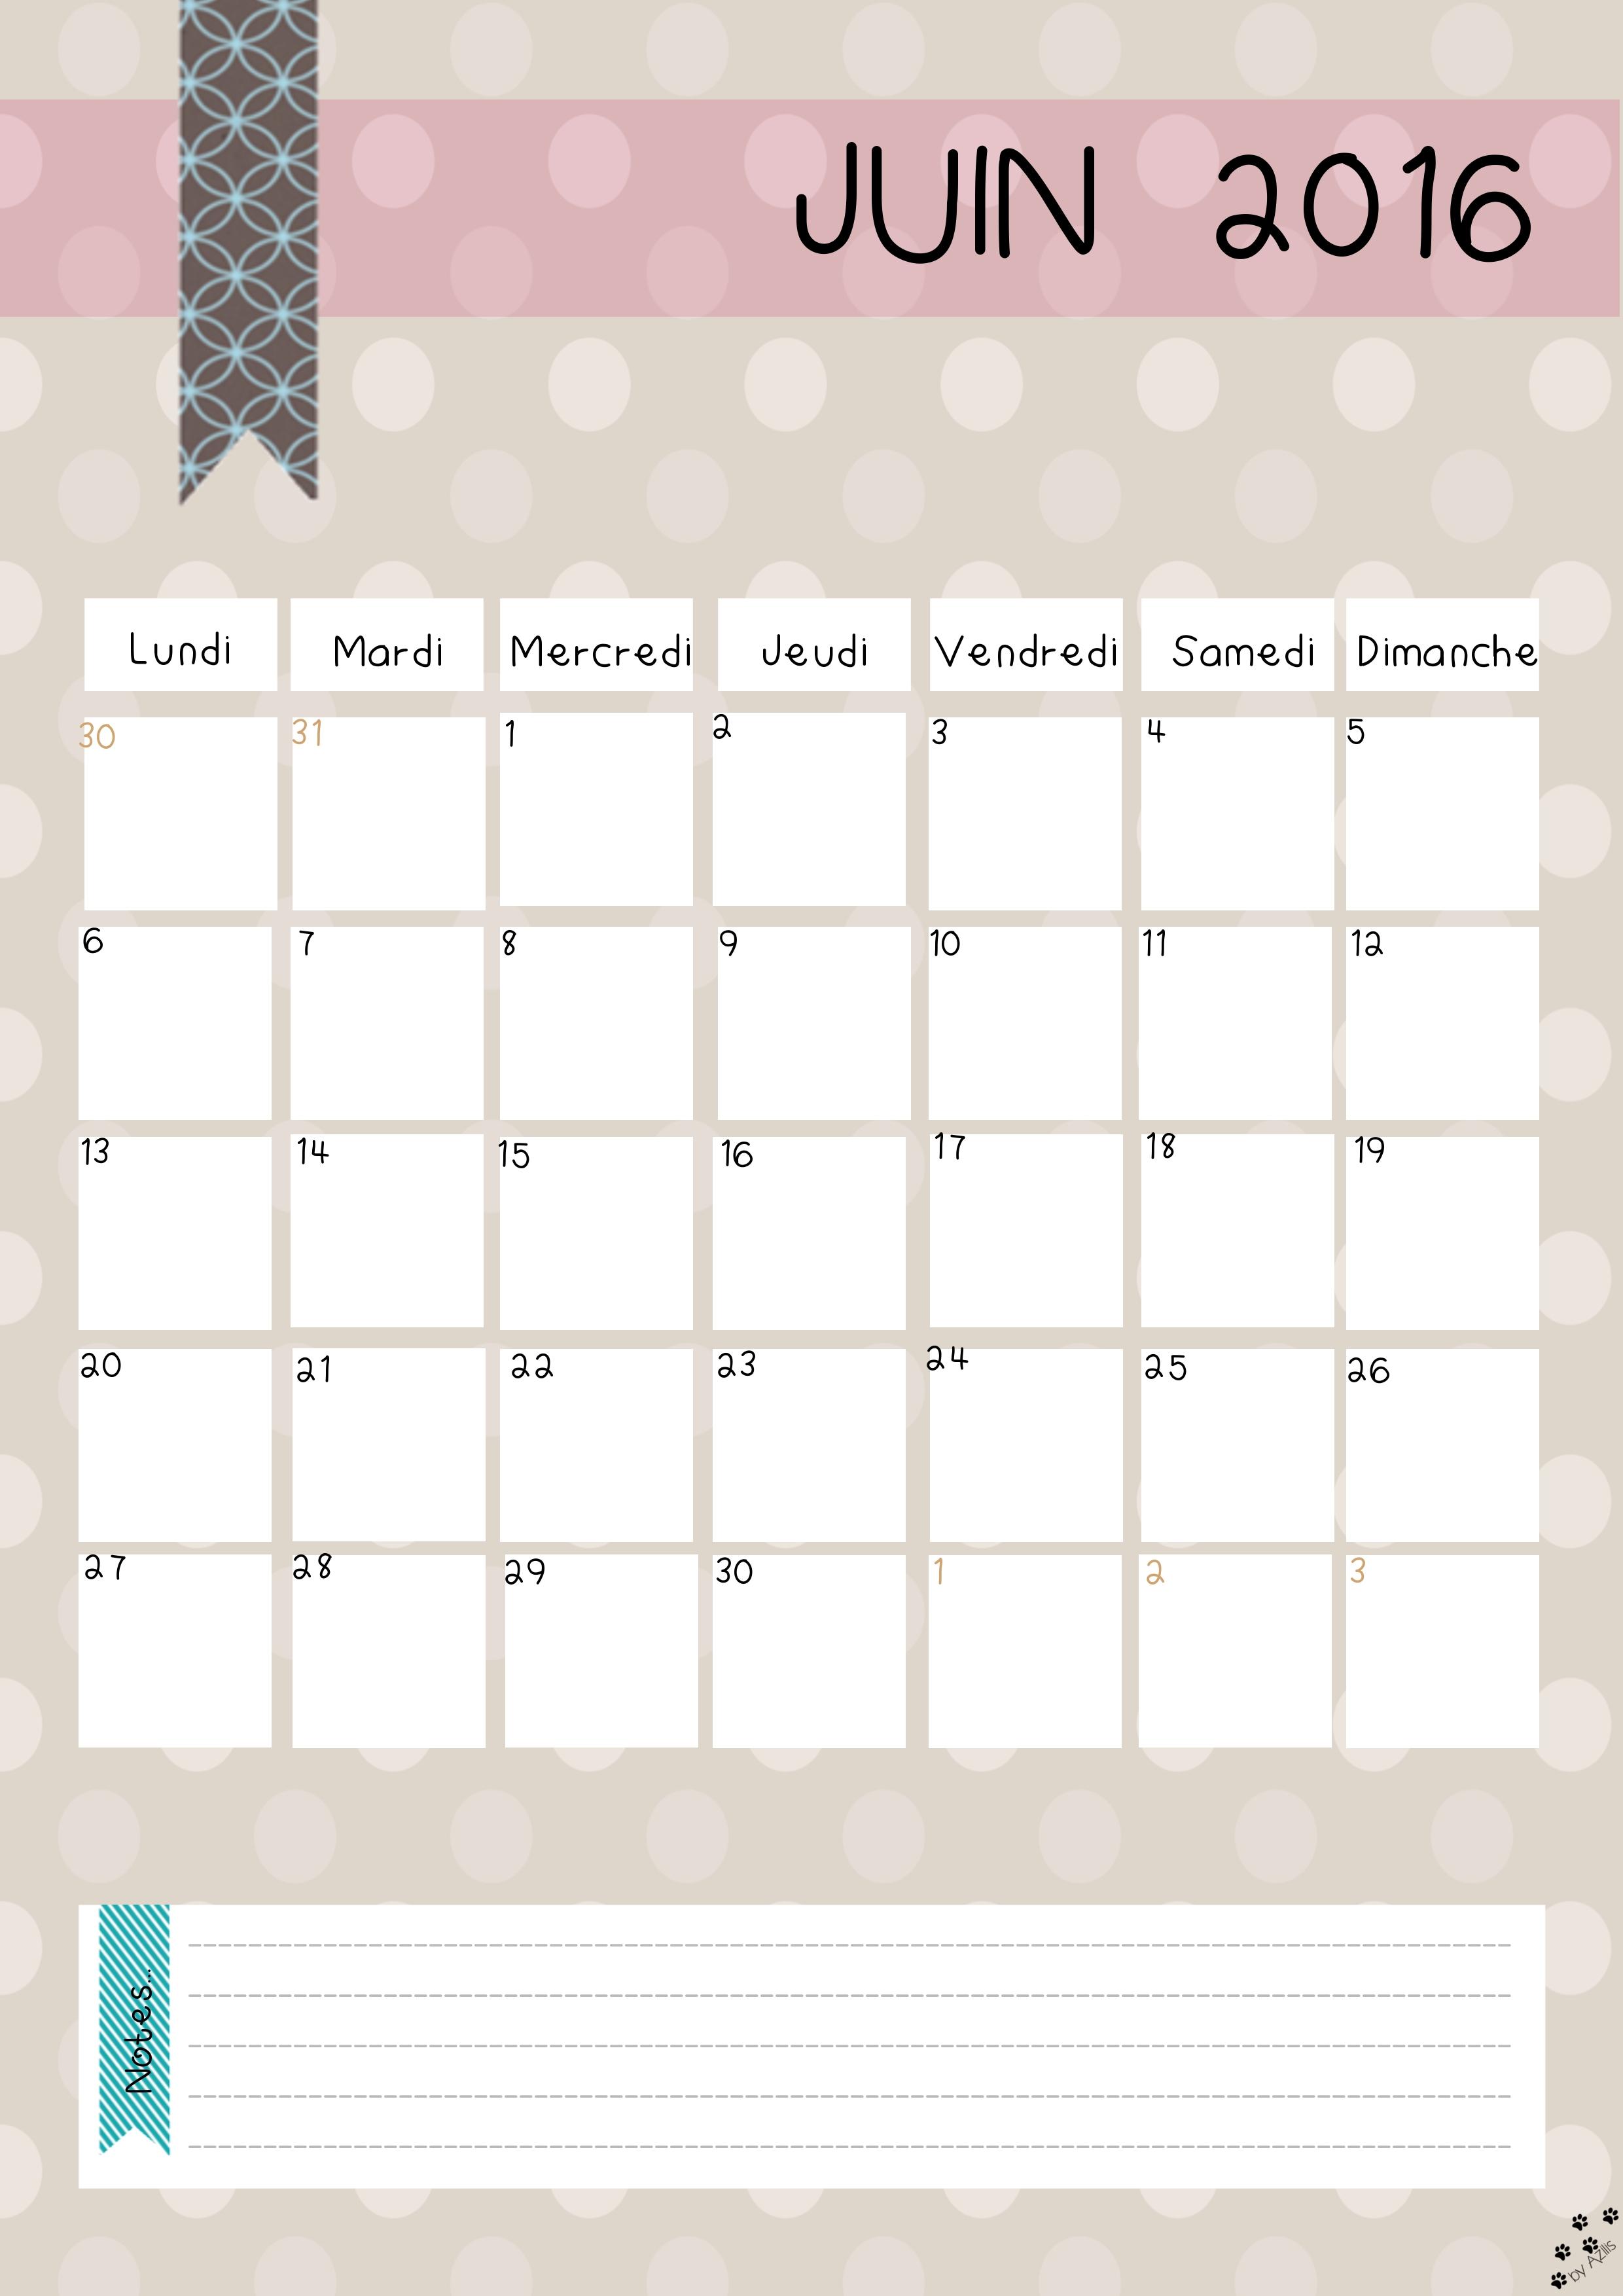 Diy calendrier 2016 gratuit imprimer for Calendrier jardin juin 2015